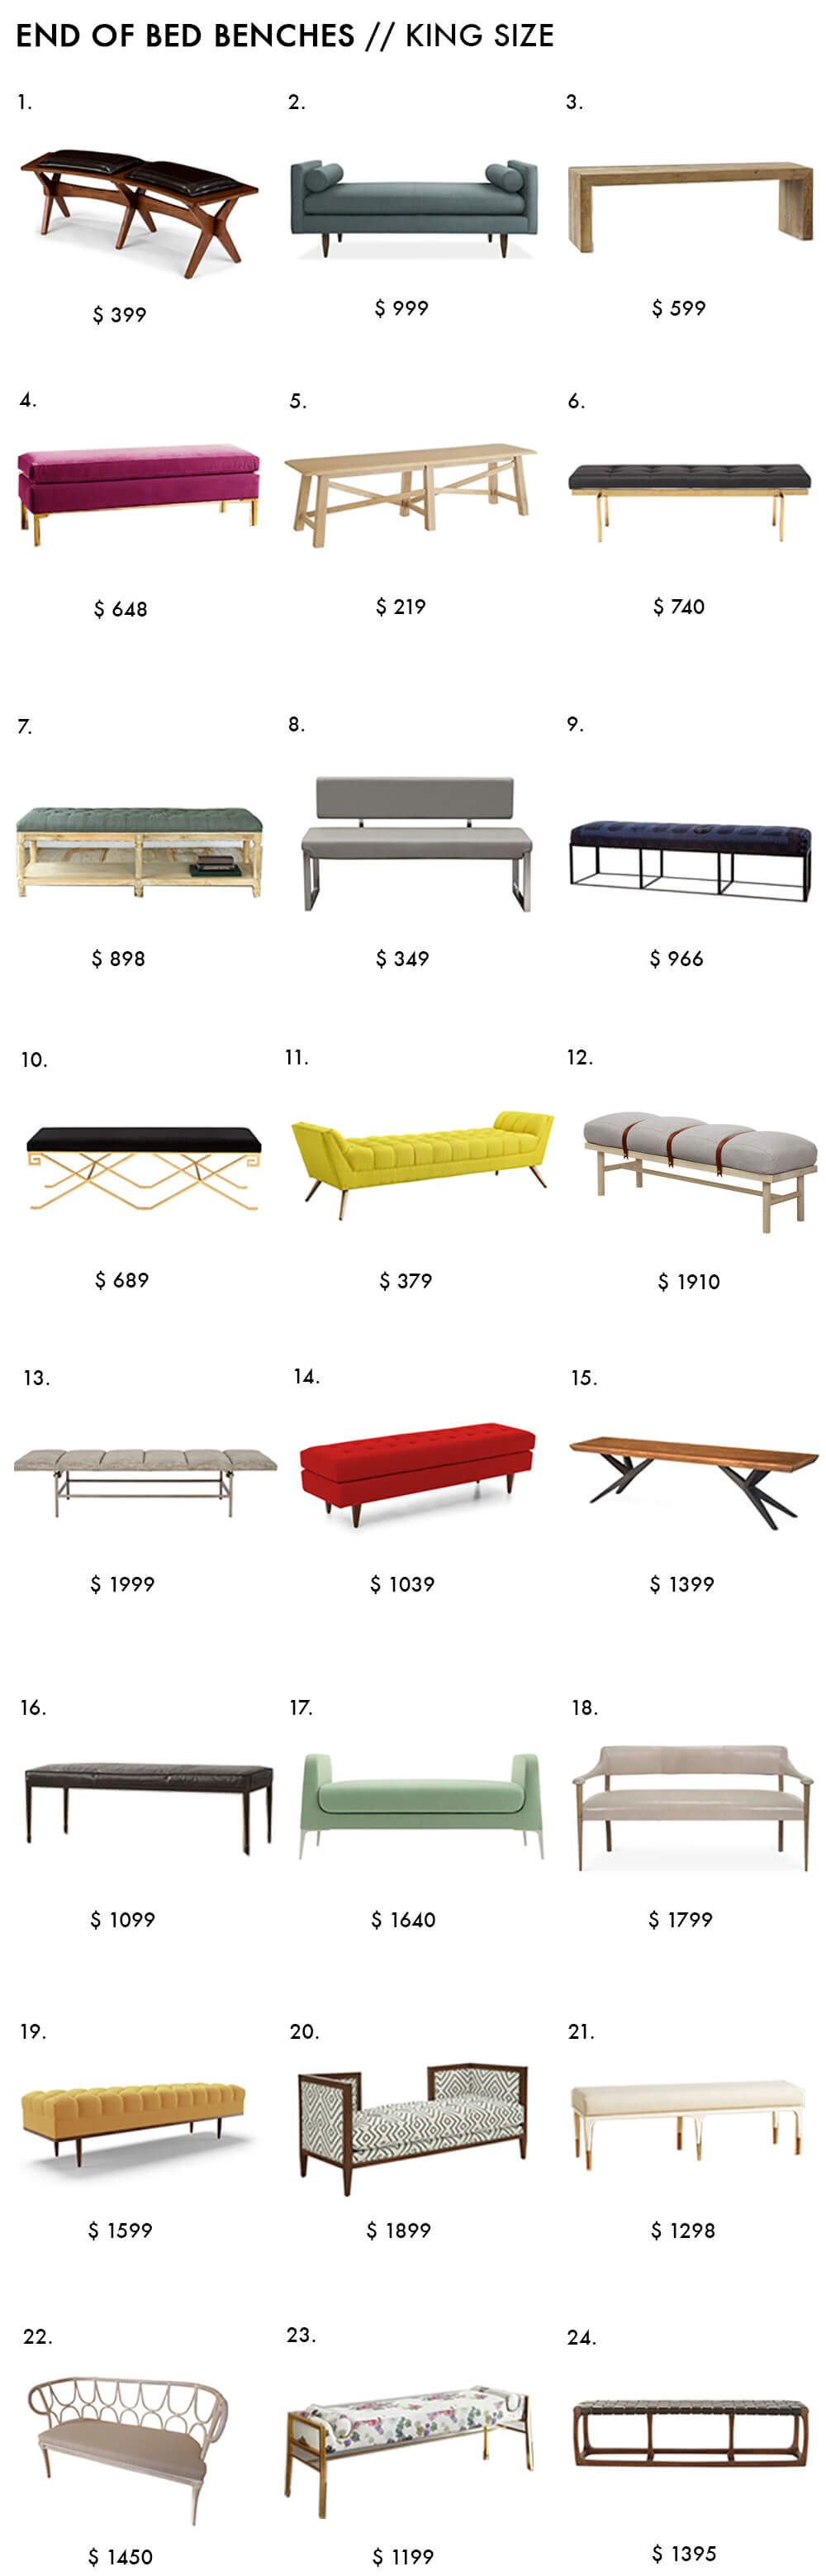 17+ King size bedroom storage bench info